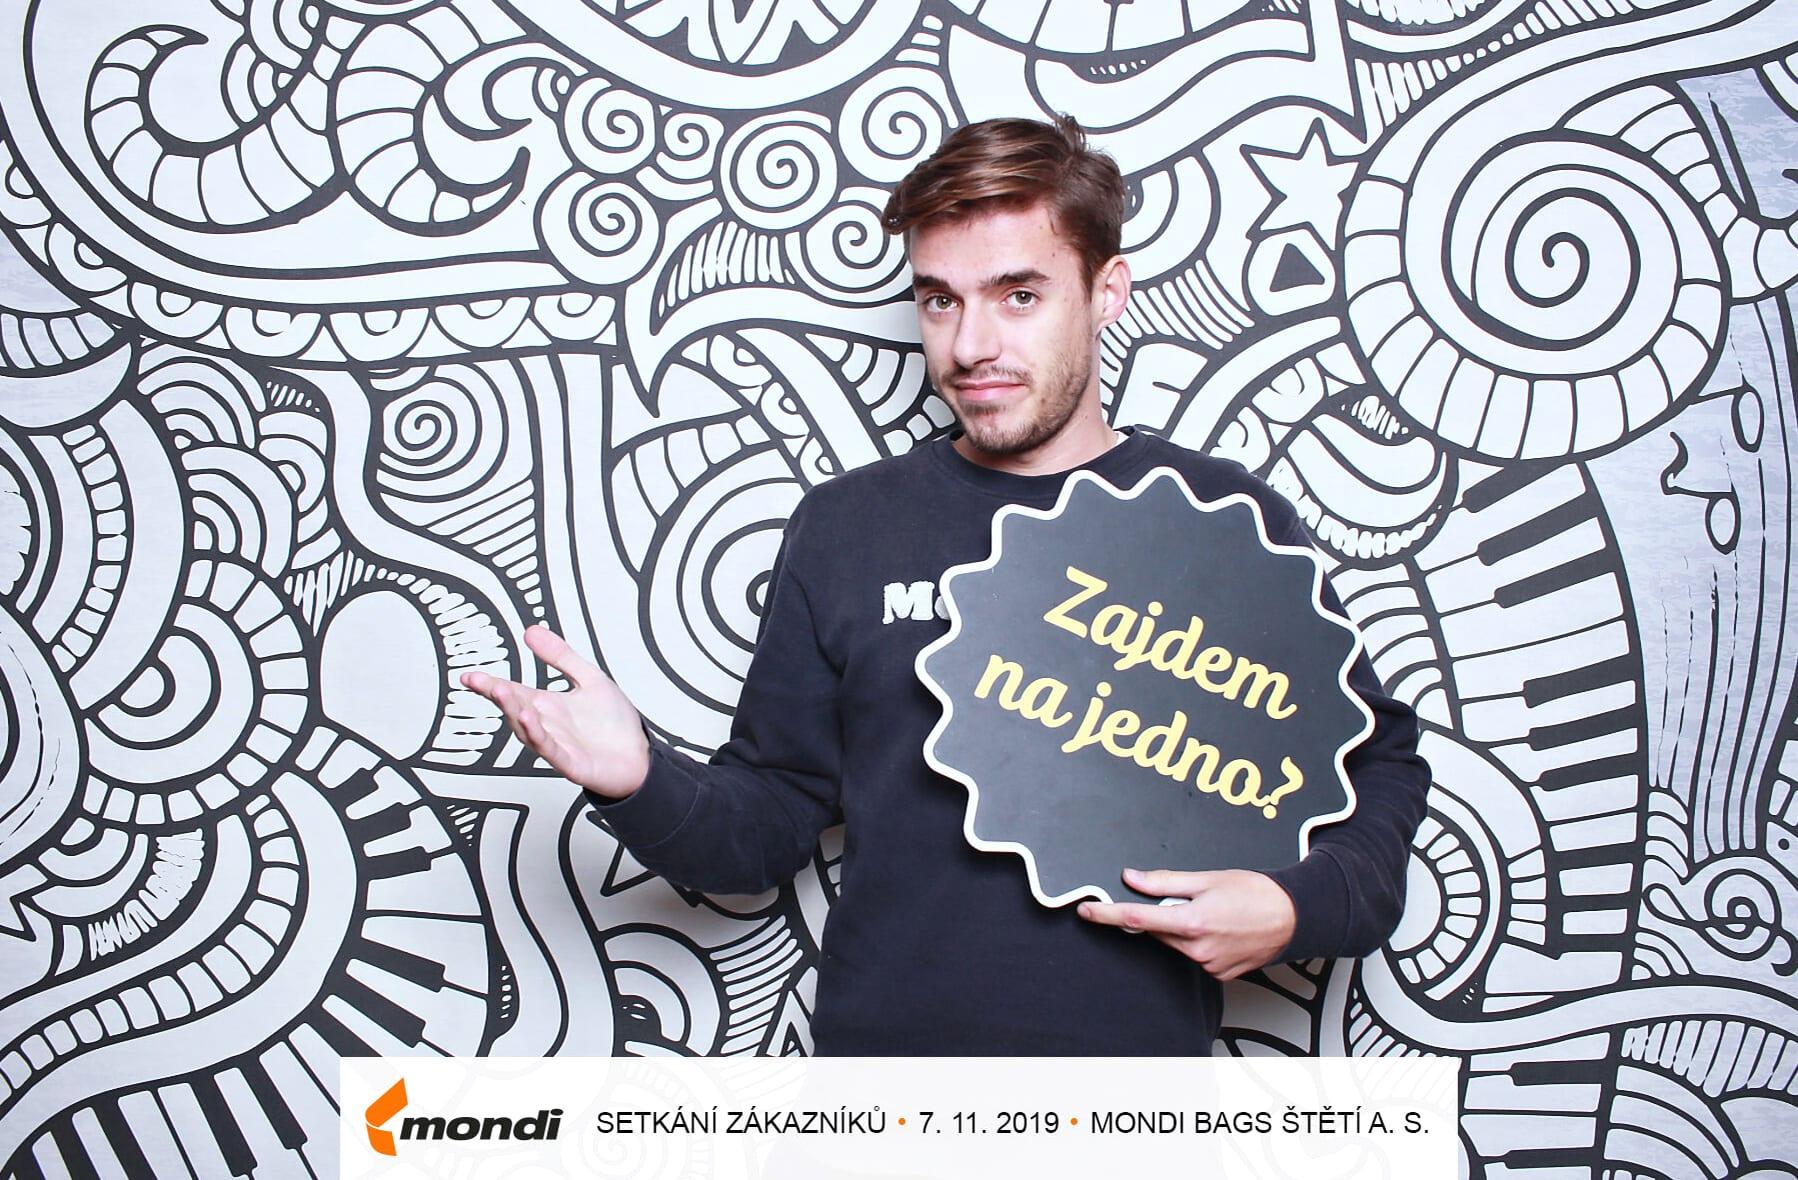 fotokoutek-firemni-vecirek-praha-mondi-7-11-2019-668860